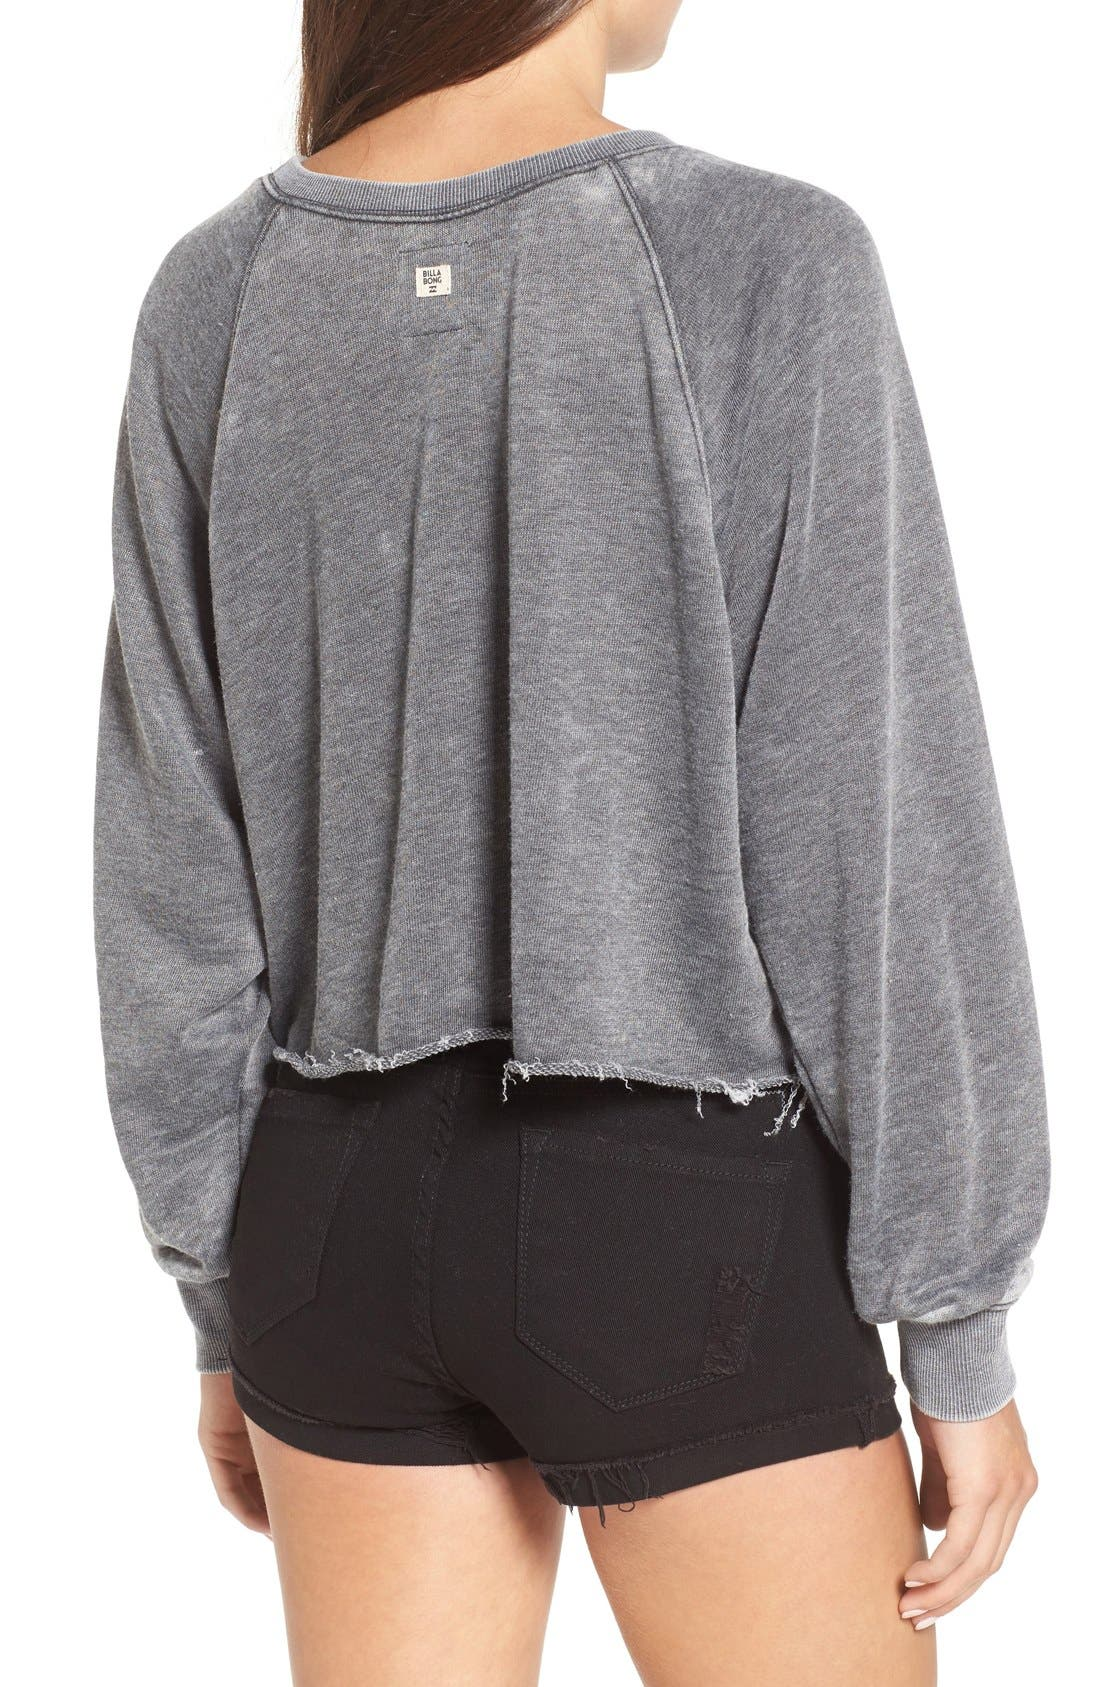 Alternate Image 2  - Billabong 'Again & Again' Crop Sweatshirt